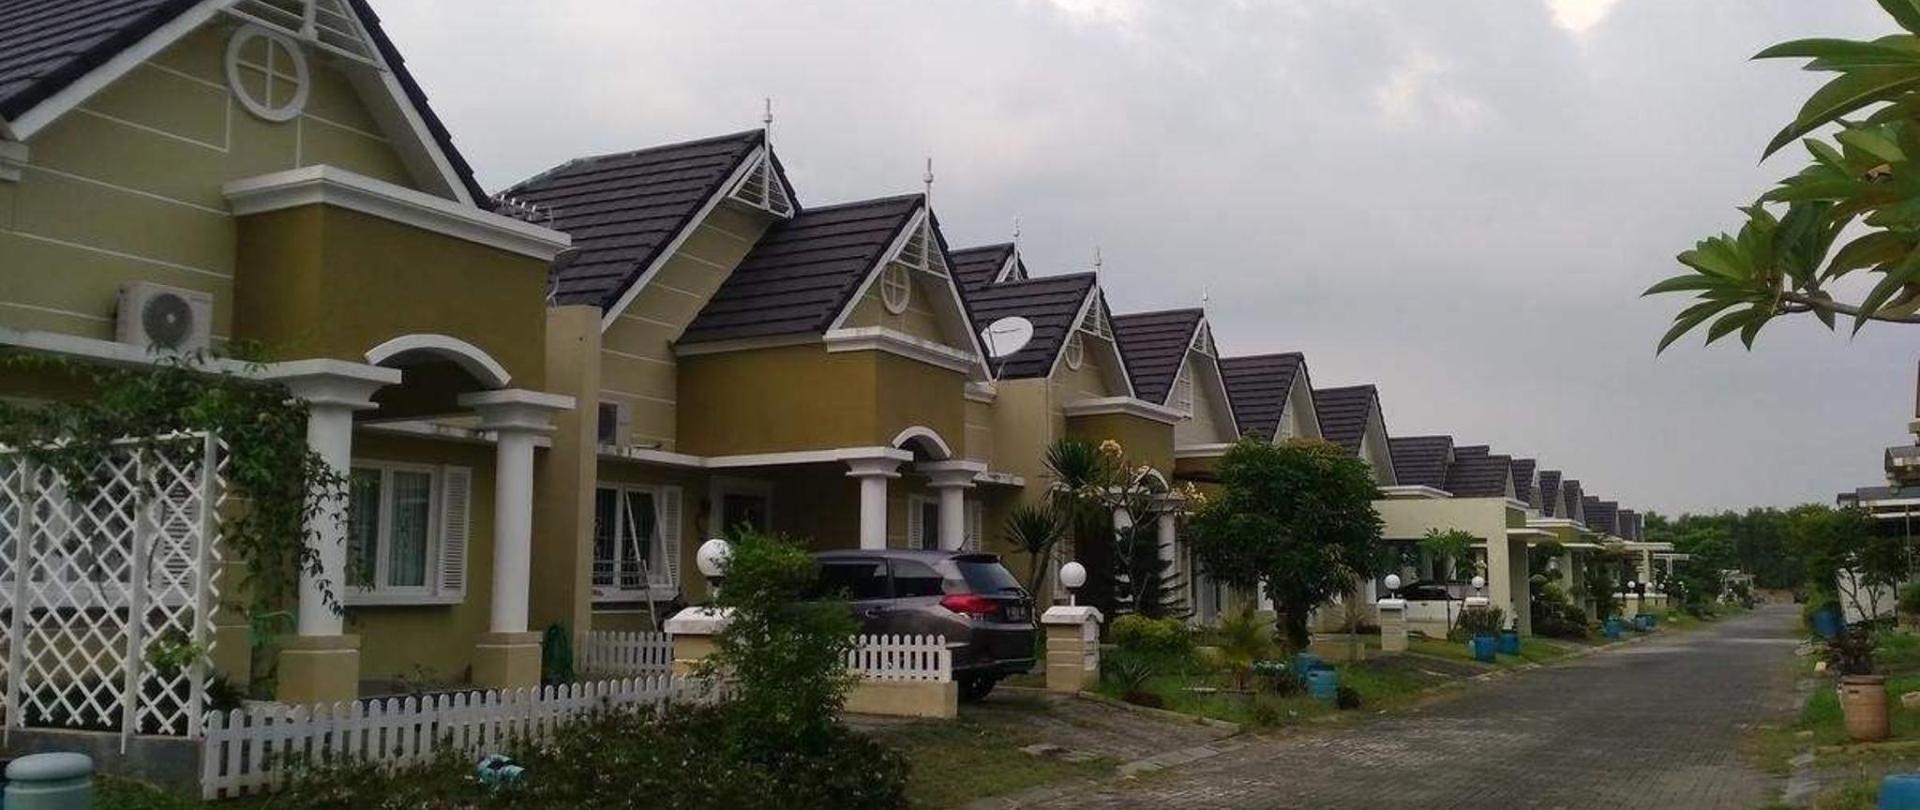 Jasmine Park Guest House Semarang Indonesia 99027725 Jpg Taman Diponegoro